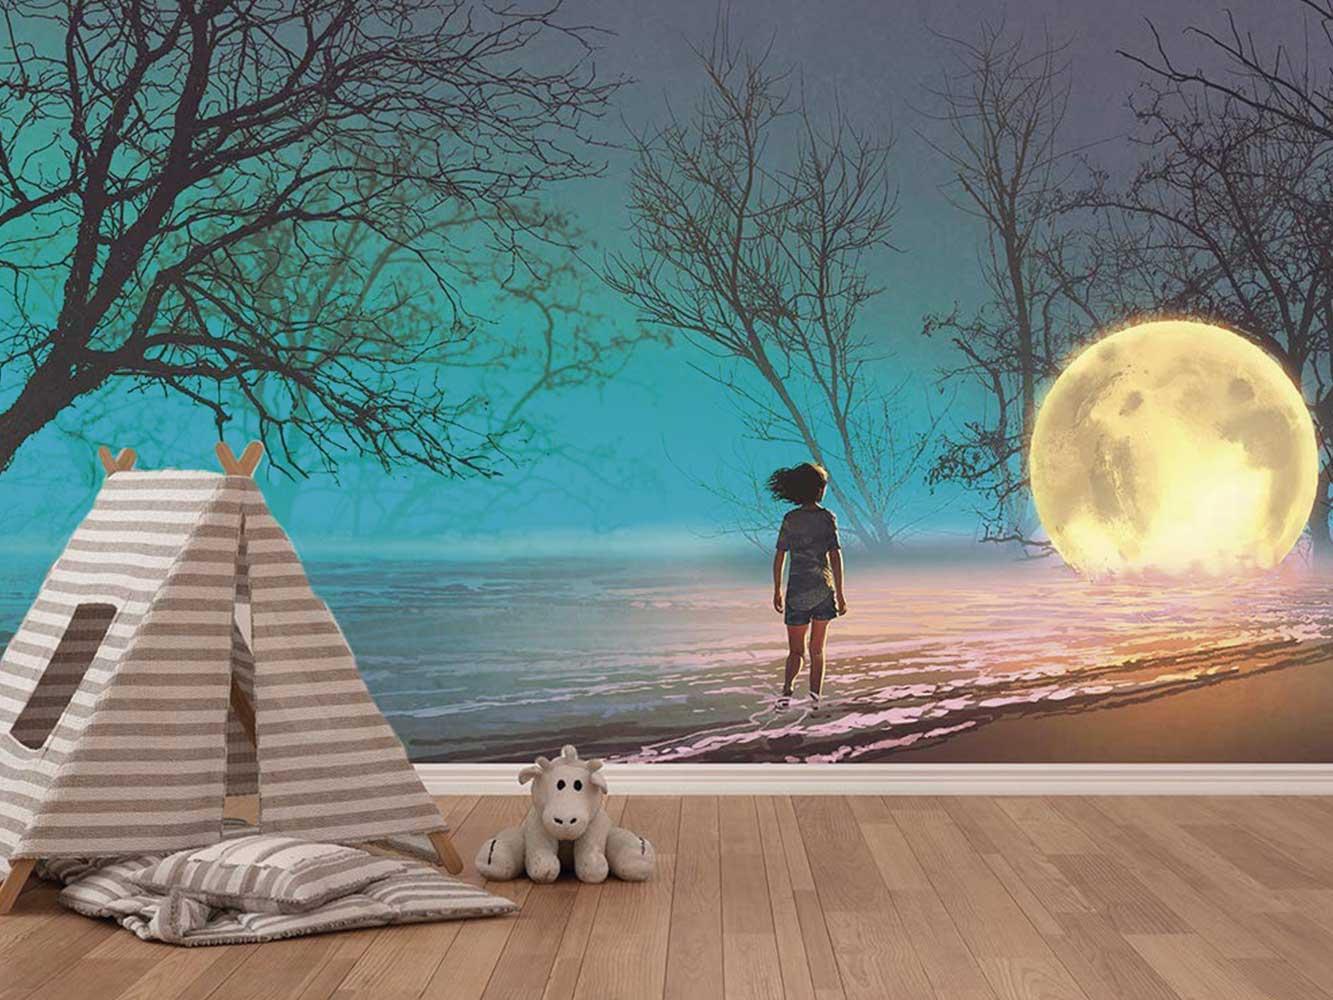 Fotomural Vinilo Paseo Por la Playa Luna   Carteles XXL - Impresión carteleria publicitaria